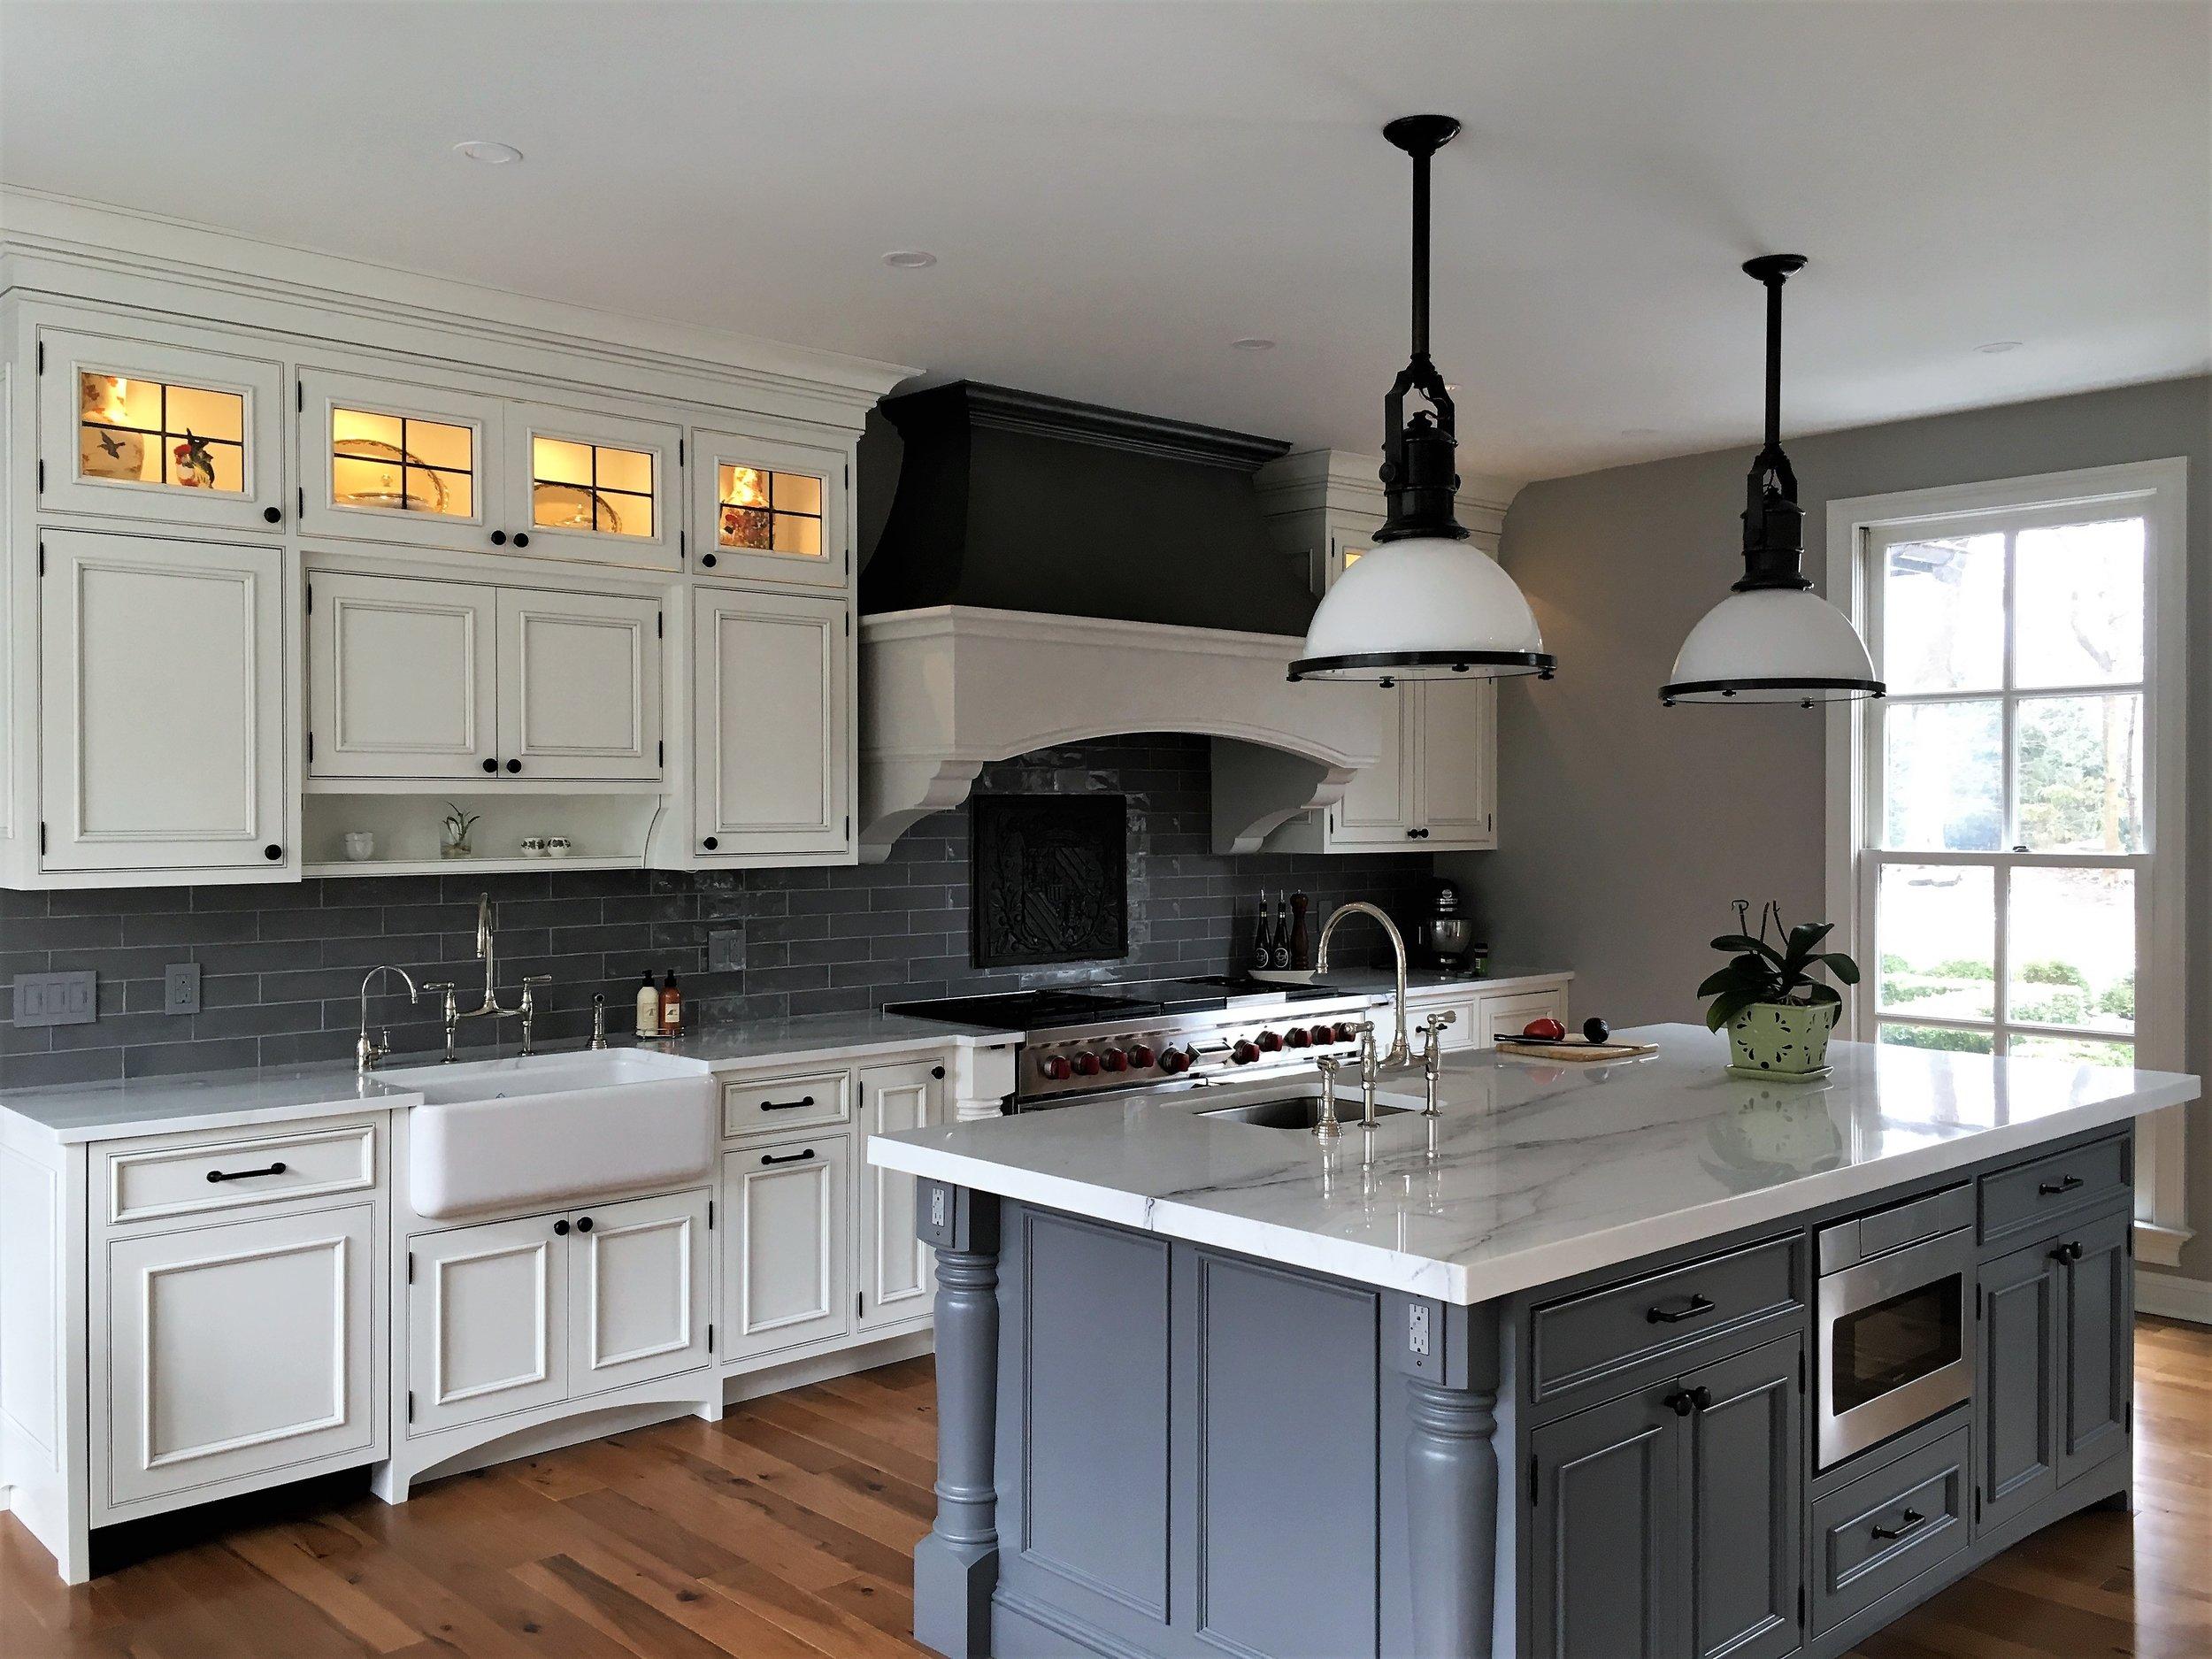 Expert Kitchen Design Zobel Co Kitchens In Saratoga And Lake George